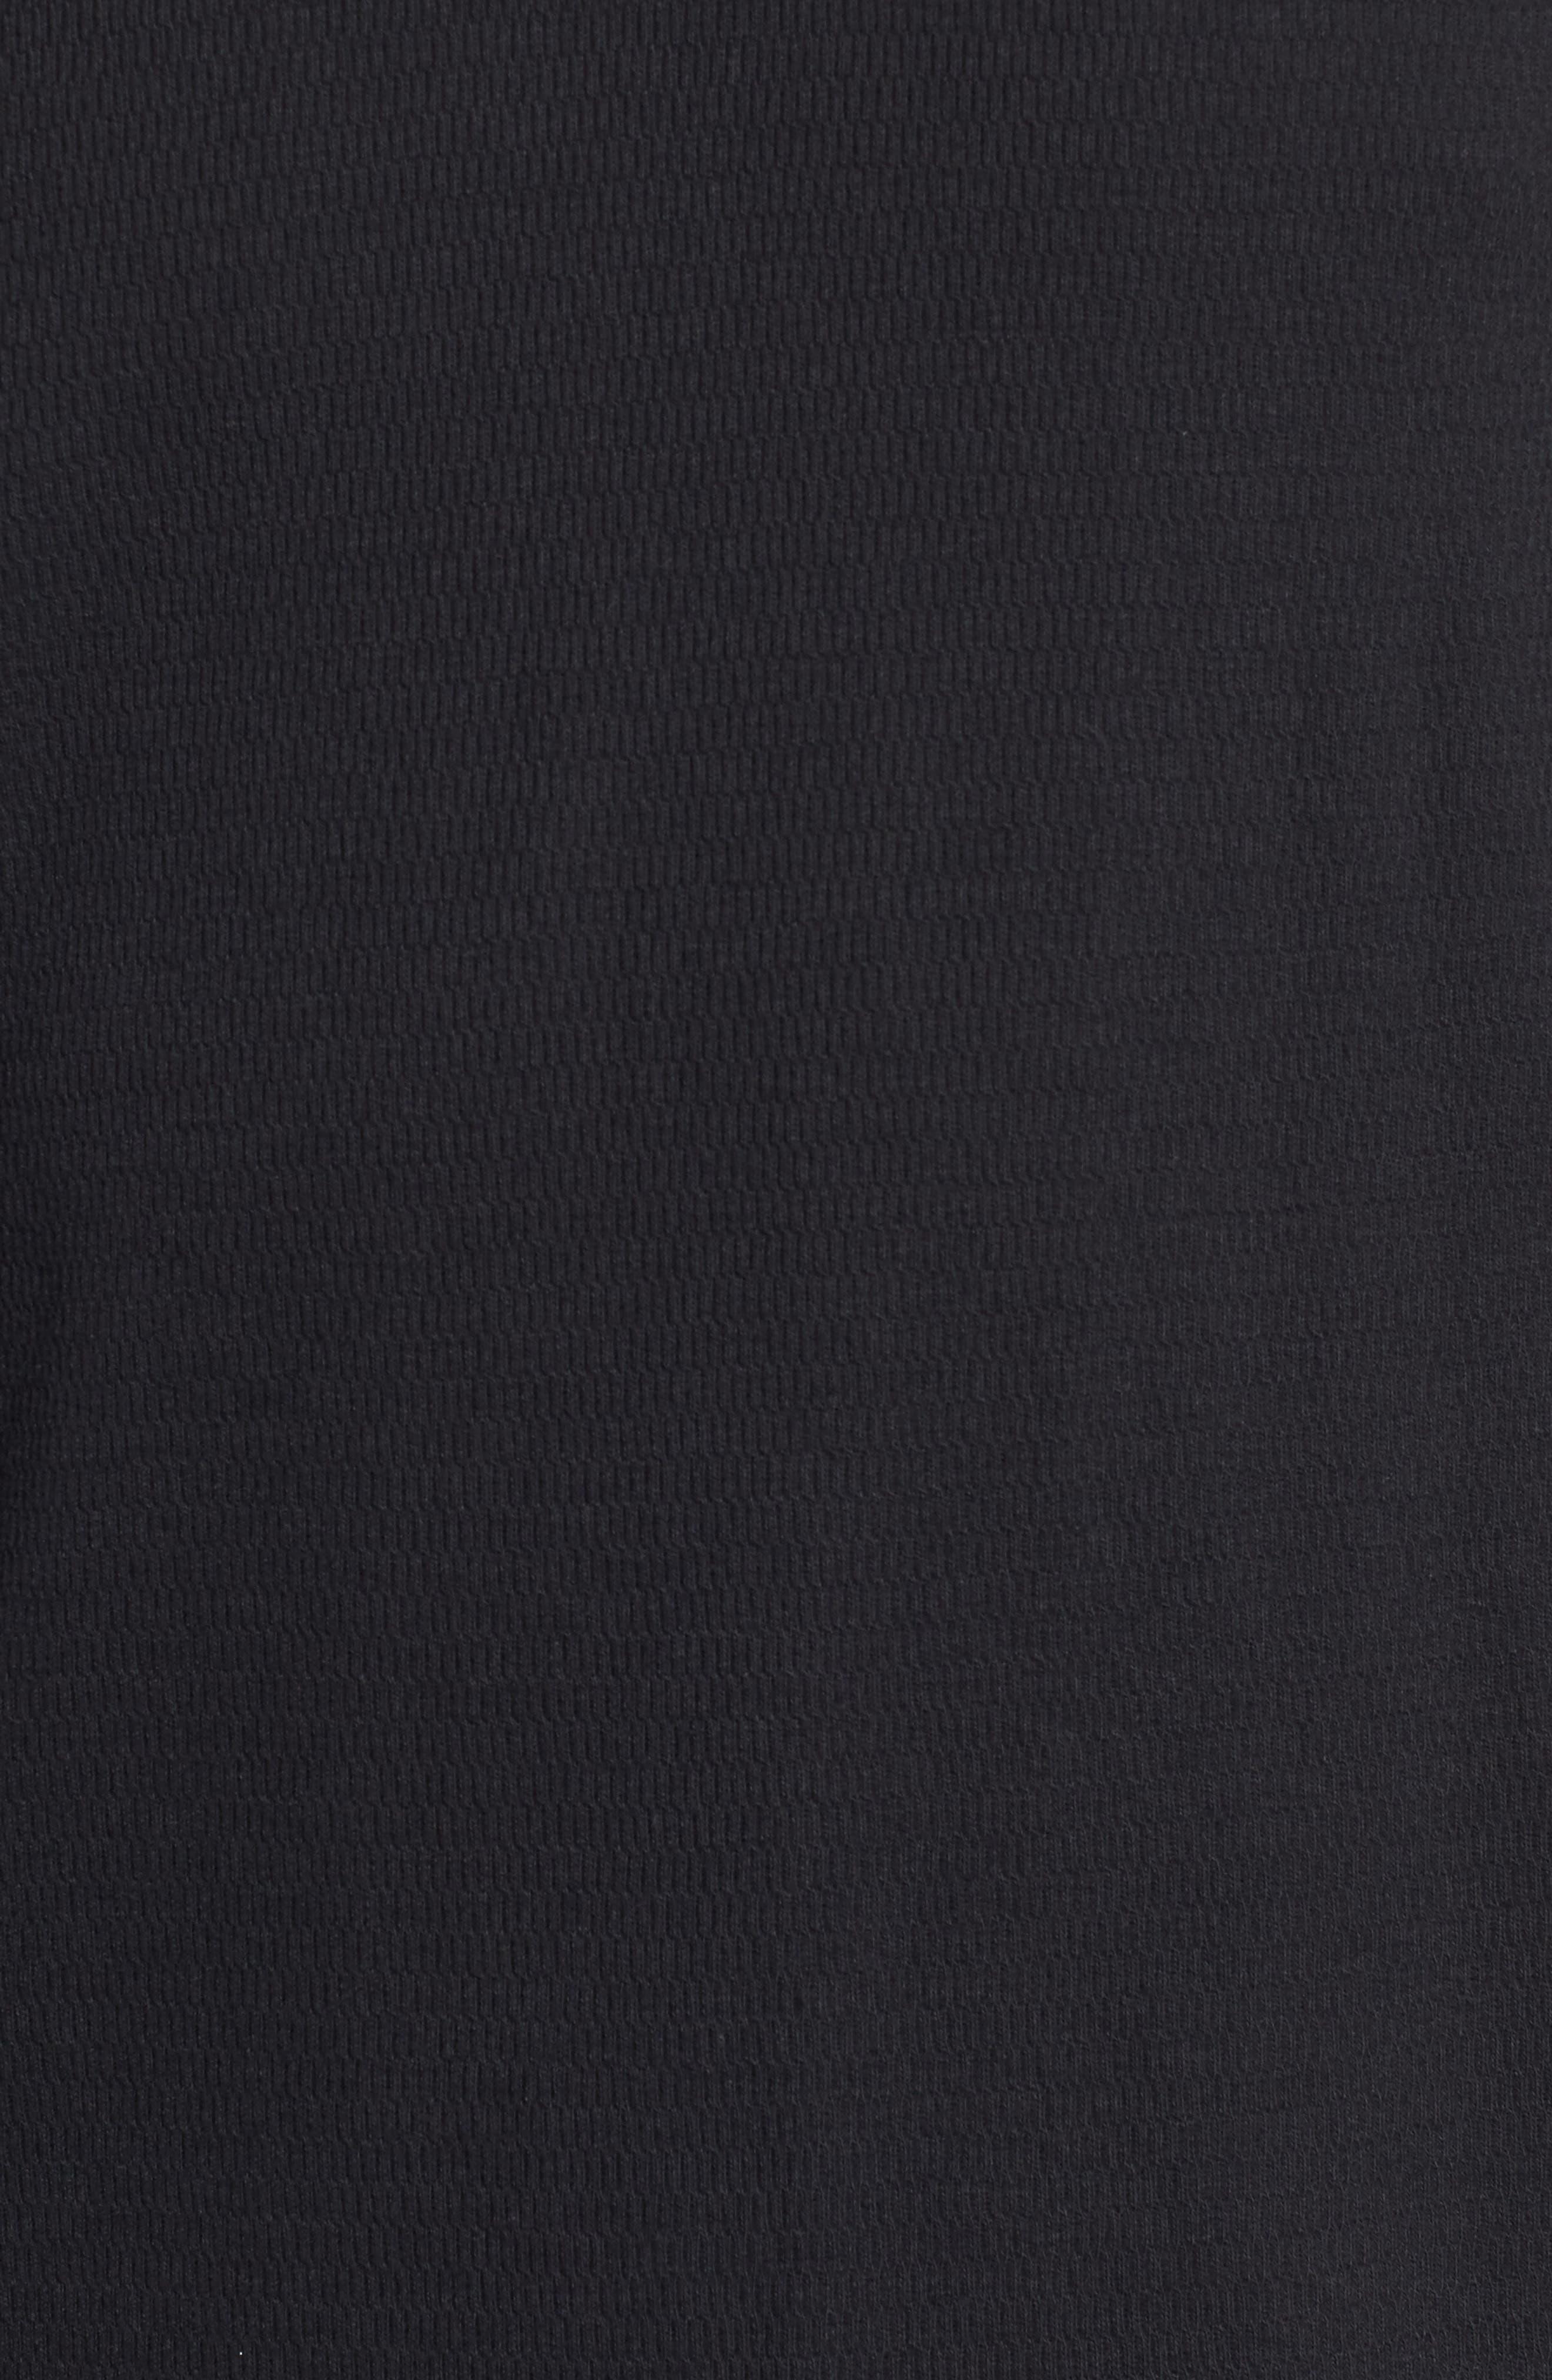 Notch Neck Thermal T-Shirt,                             Alternate thumbnail 30, color,